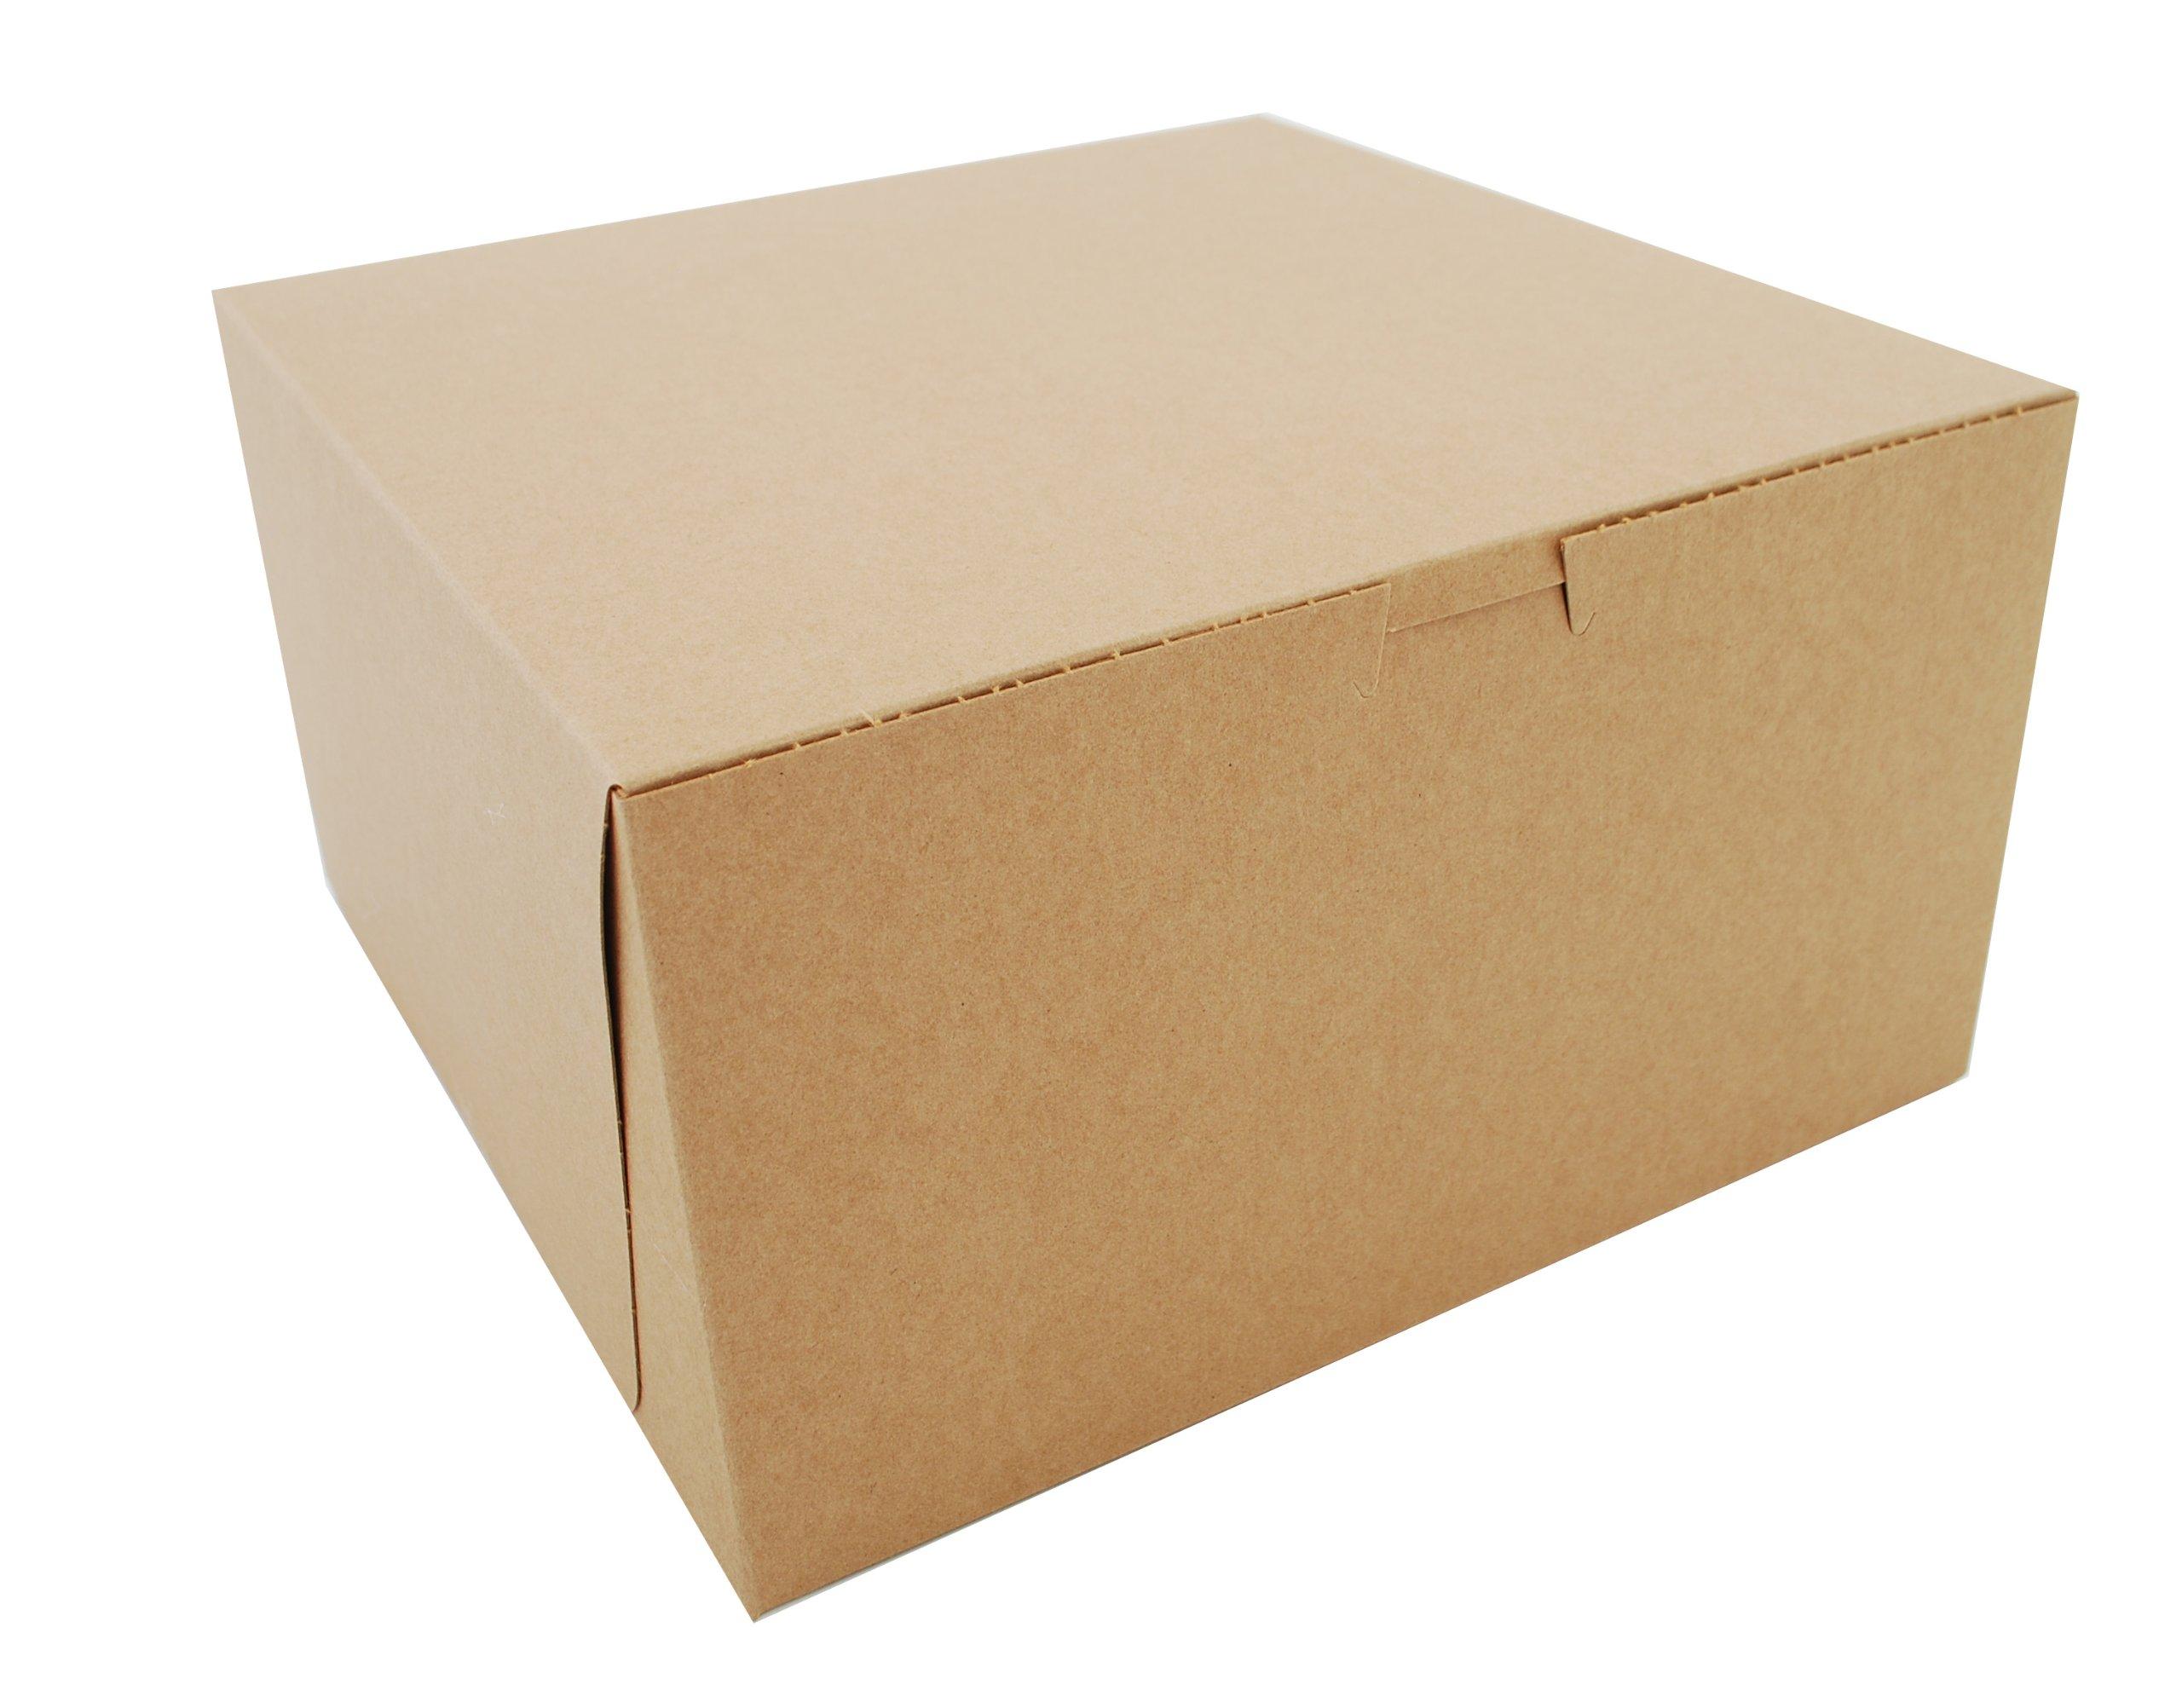 Southern Champion Tray 0977K Kraft Paperboard Non Window Lock Corner Bakery Box, 10'' Length x 10'' Width x 5-1/2'' Height (Case of 100)